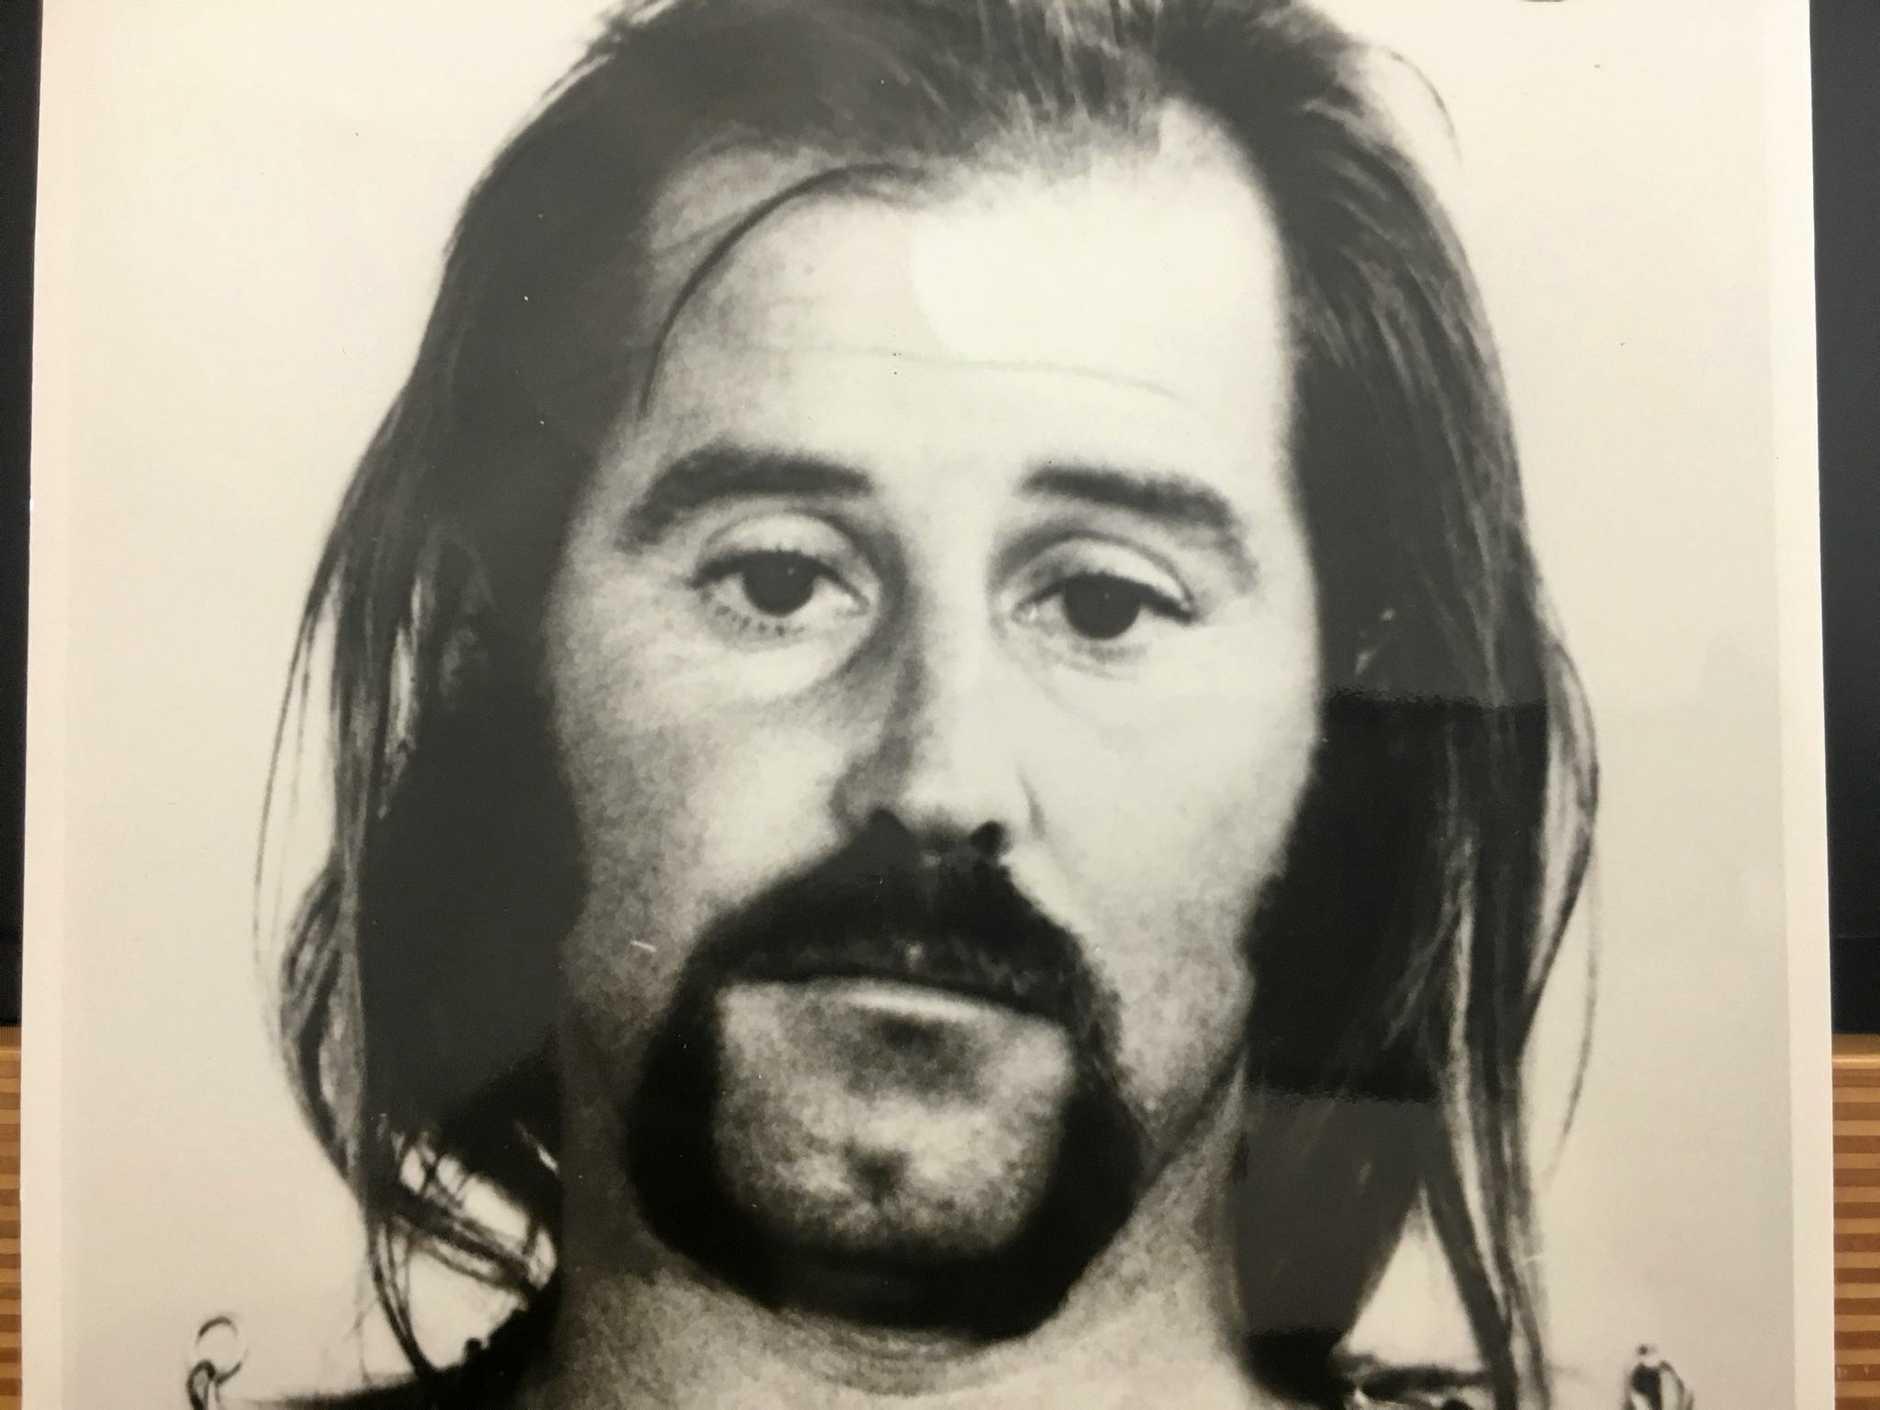 Garry Reginald 'Shorty' Dubois in the 1970s.